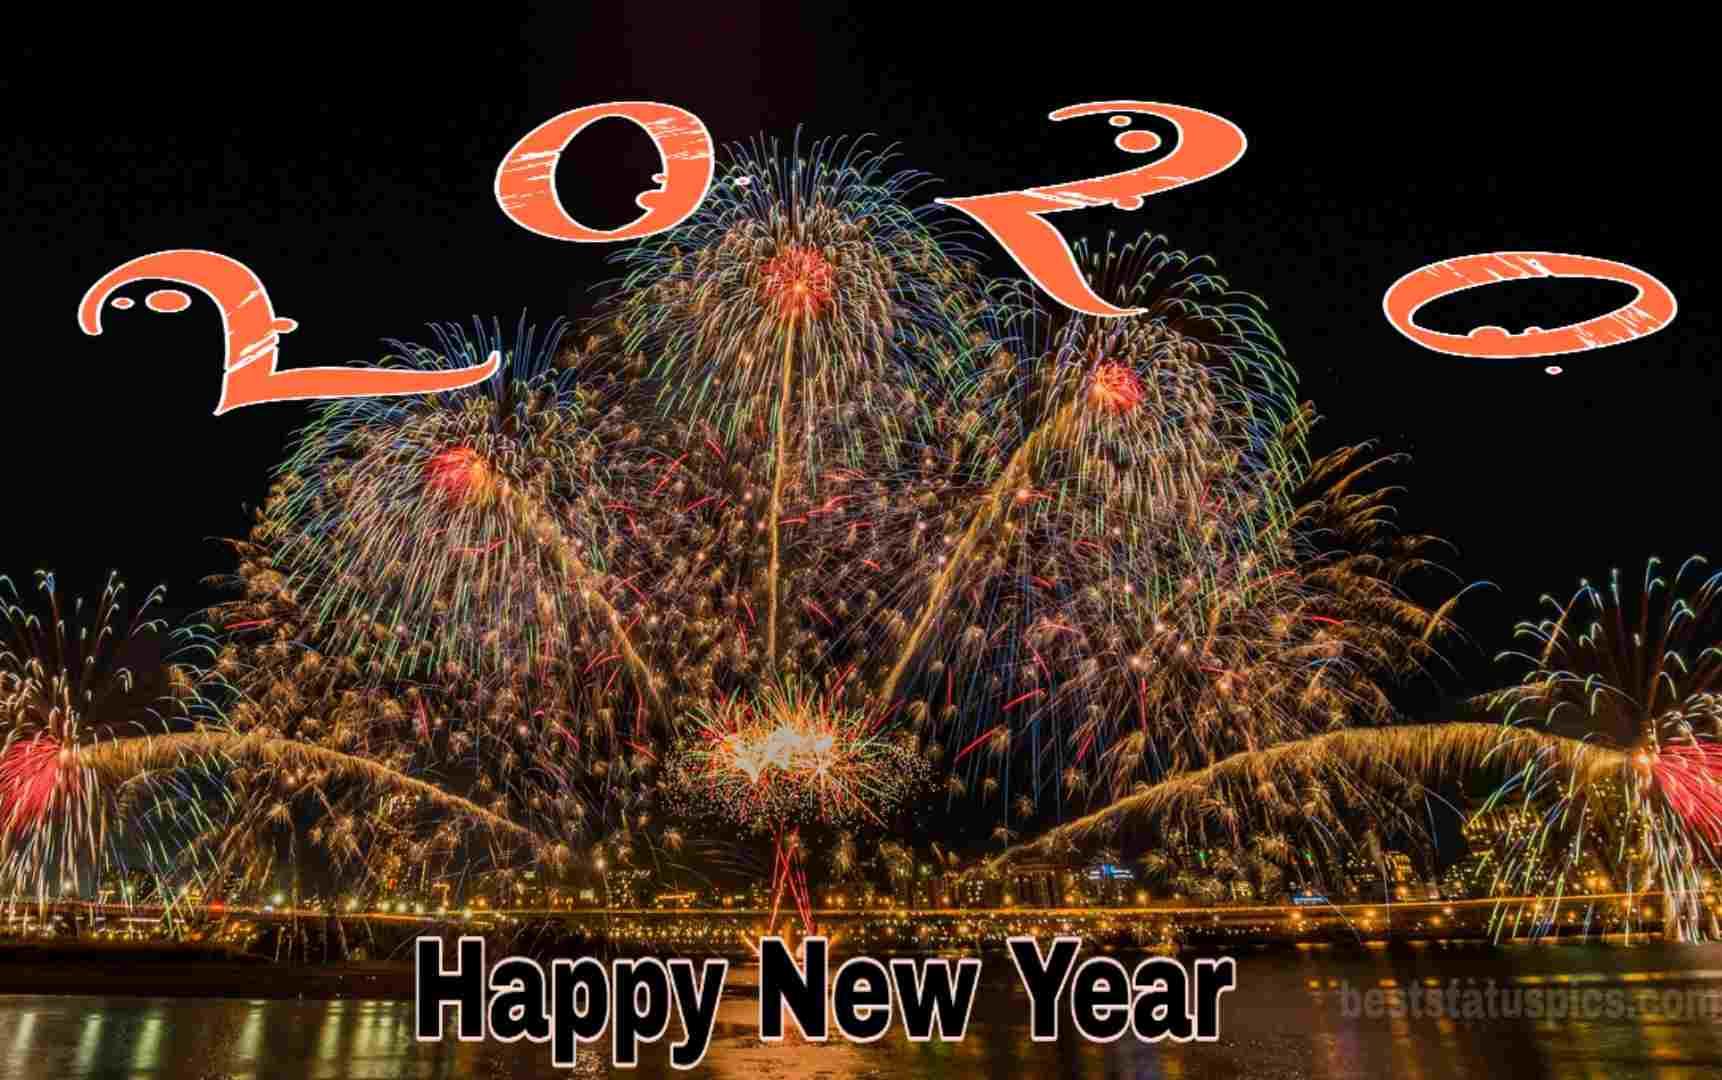 Whatsapp DP Happy New Year 2020 with firework